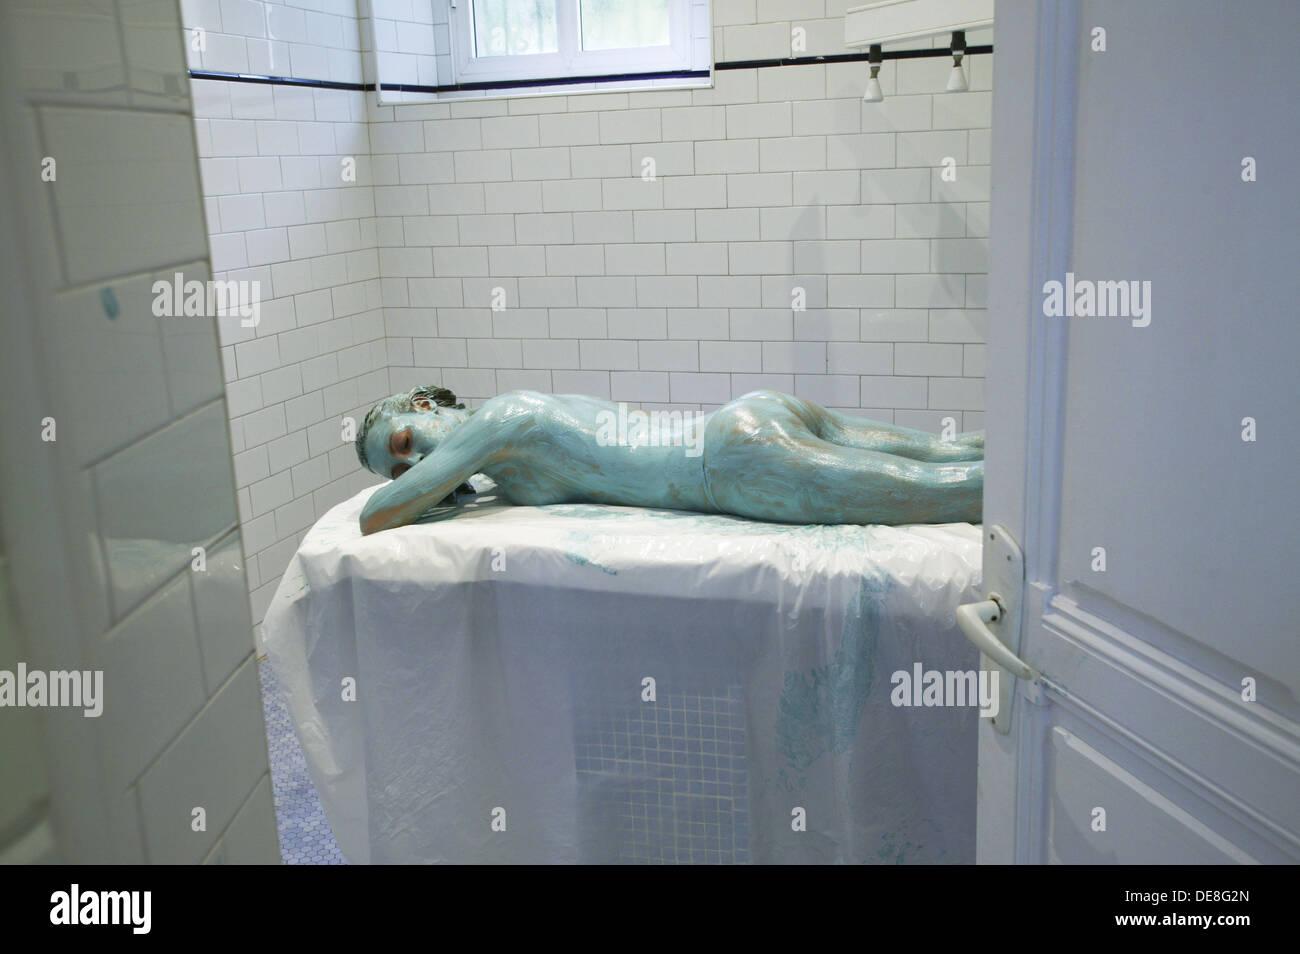 Energie, Türkis Wickel Körperbehandlung im Spa, Lierganes Farbe. Pas-Miera, Kantabrien, Spanien Stockbild